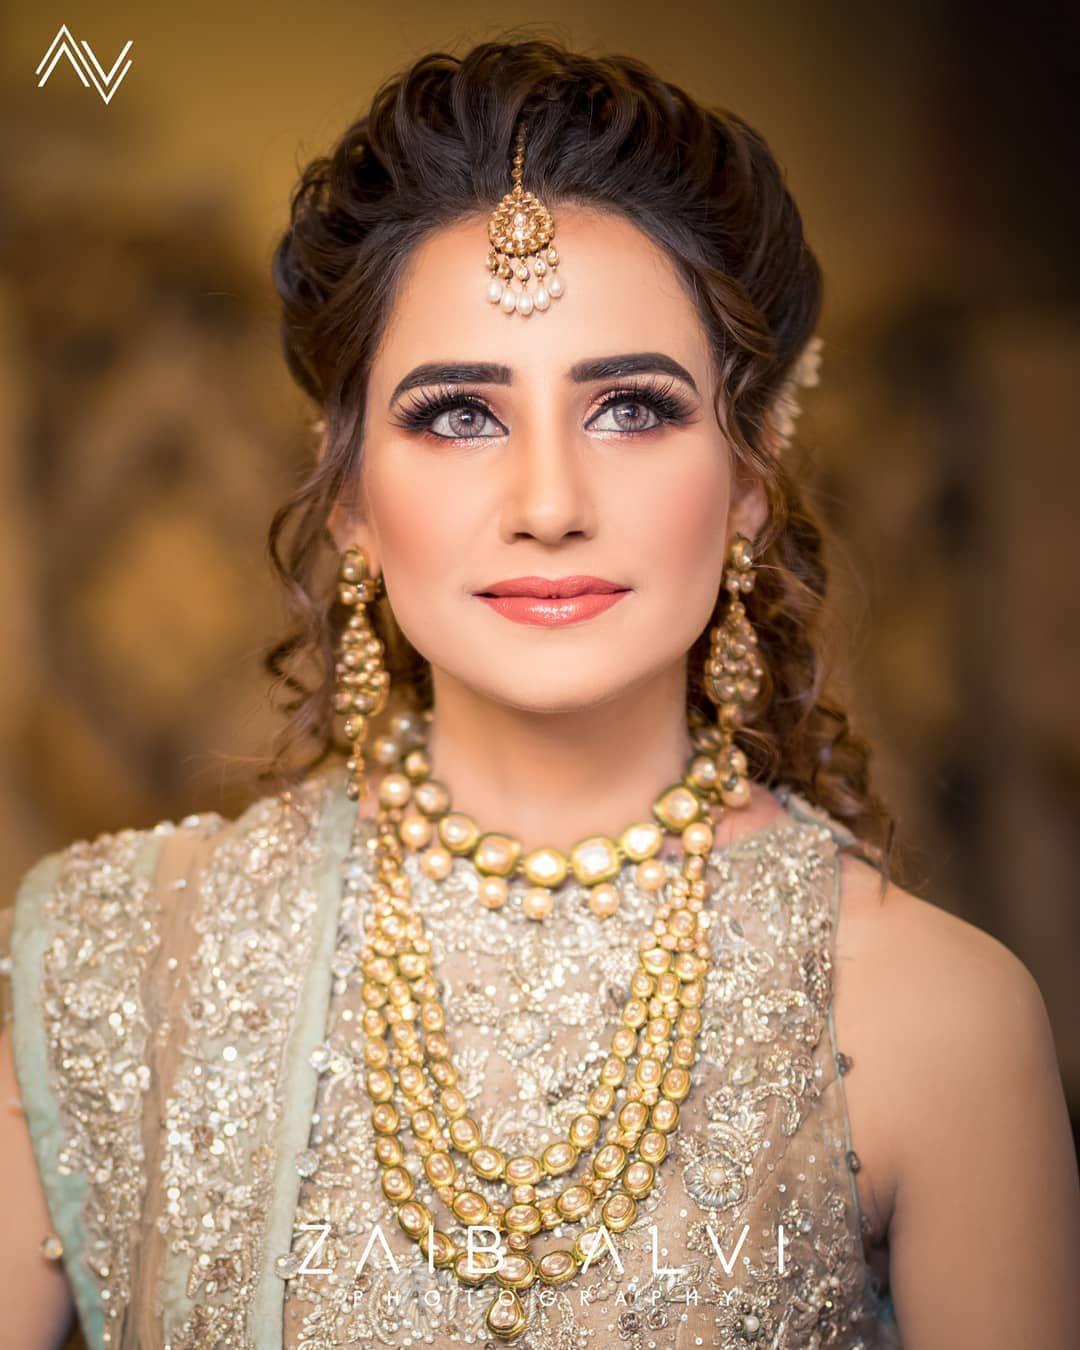 saniyashamshadhussain looking stunning on her walima 💕 you